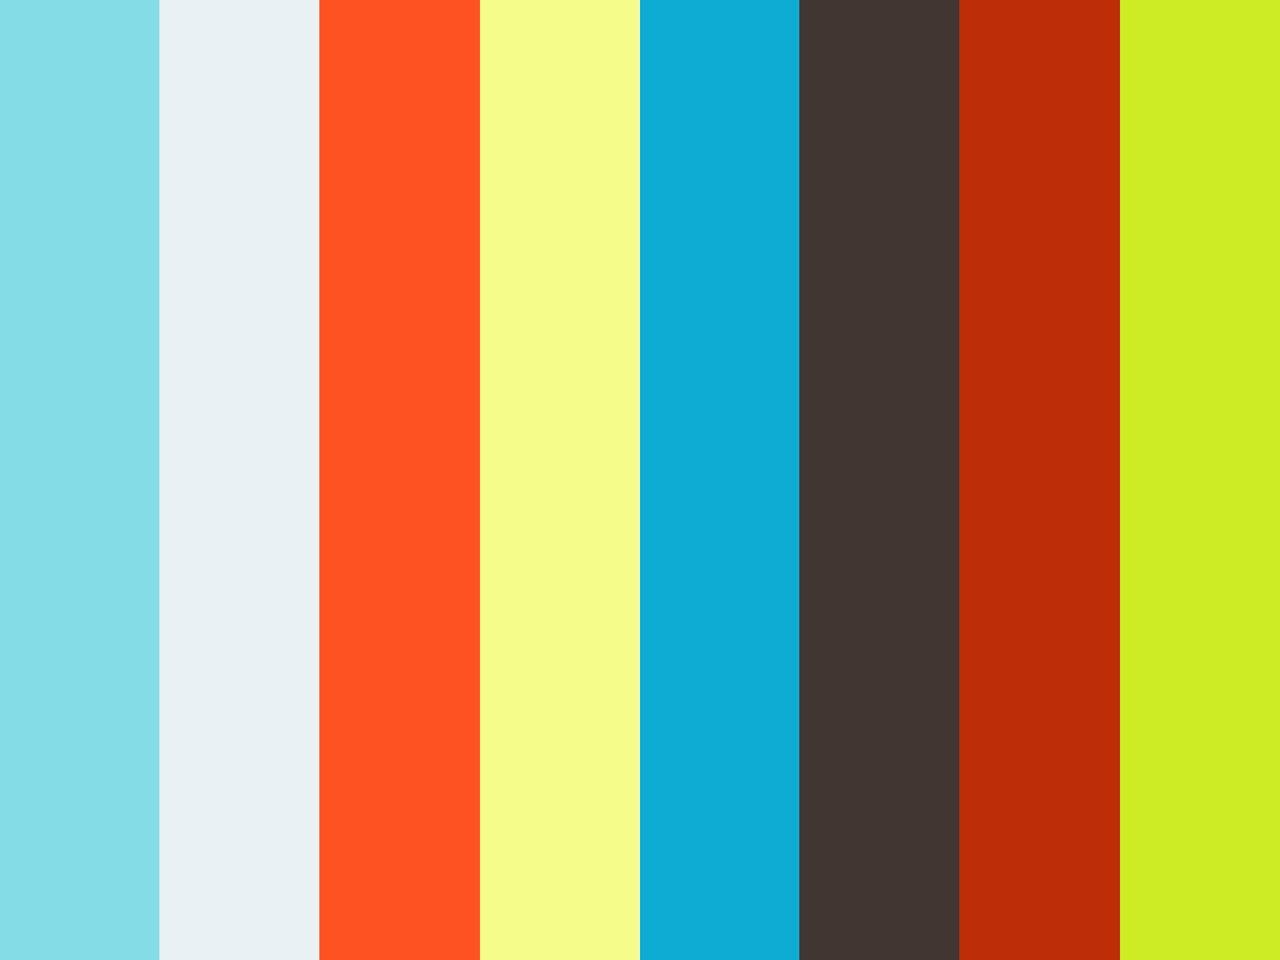 Filemaker Archives - Geist Interactive